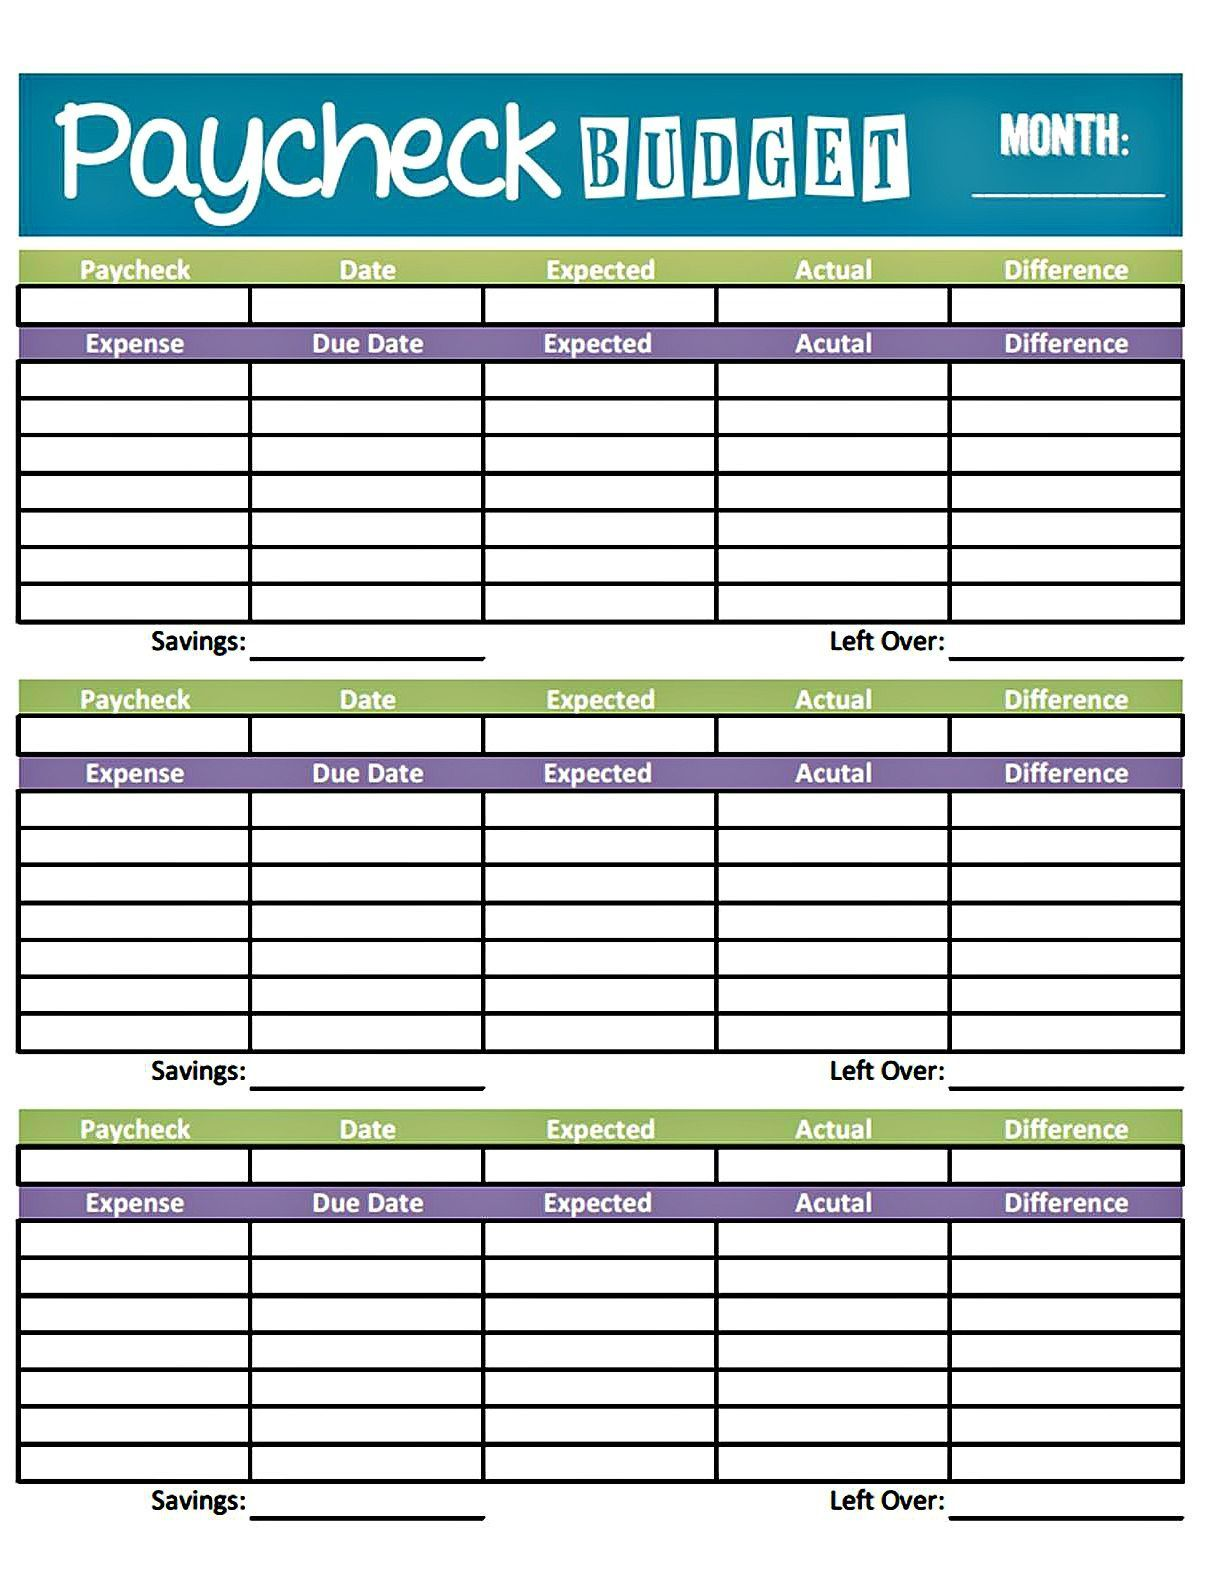 002 Wondrou Bi Weekly Budget Template 2 Concept  2020 Biweekly 2019Full